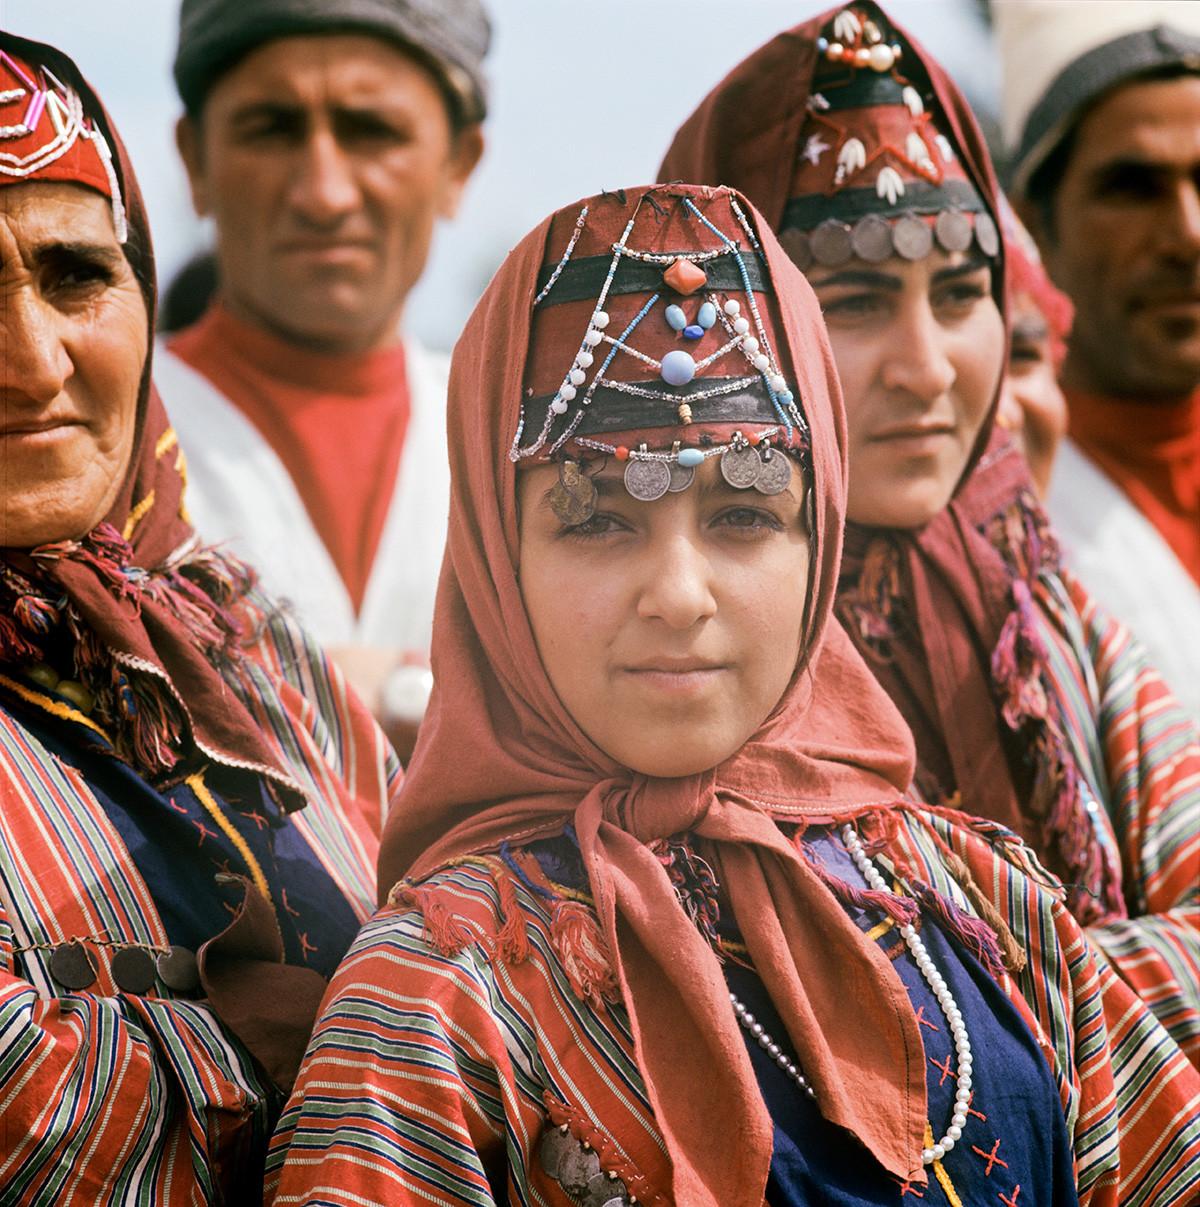 Harvest feast in Armenia